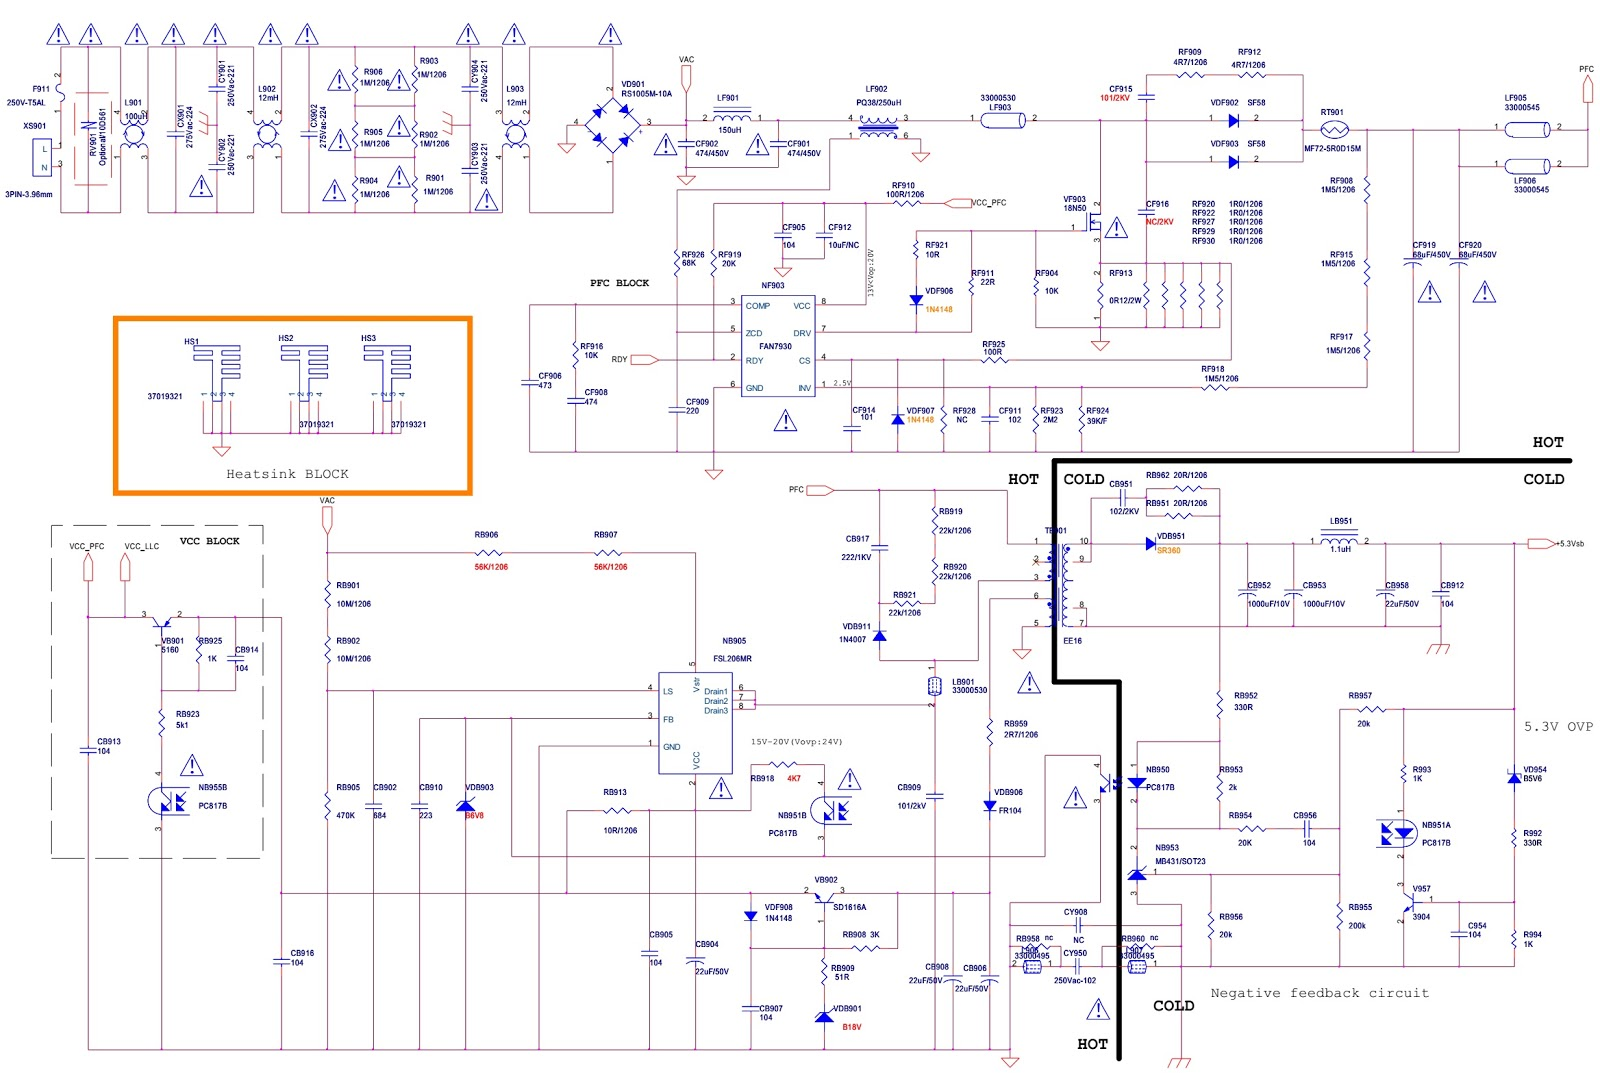 medium resolution of konka kip l090e02c1 01 psu lcd tv power supply inverter schematic